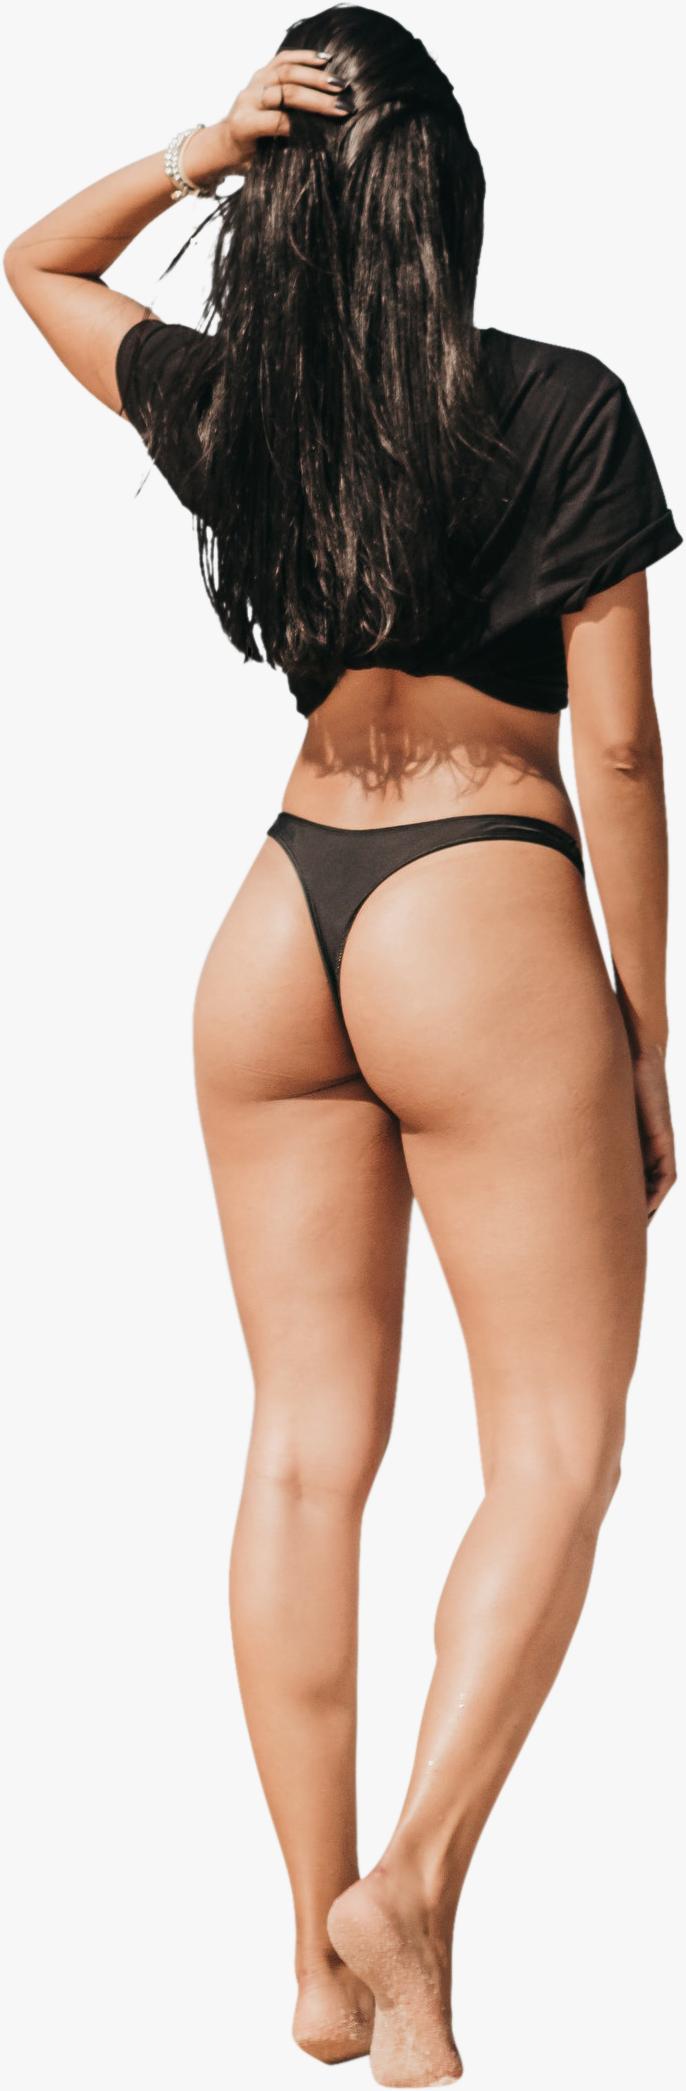 Latina Bikini Model Walking Bikini Models Bikinis Model